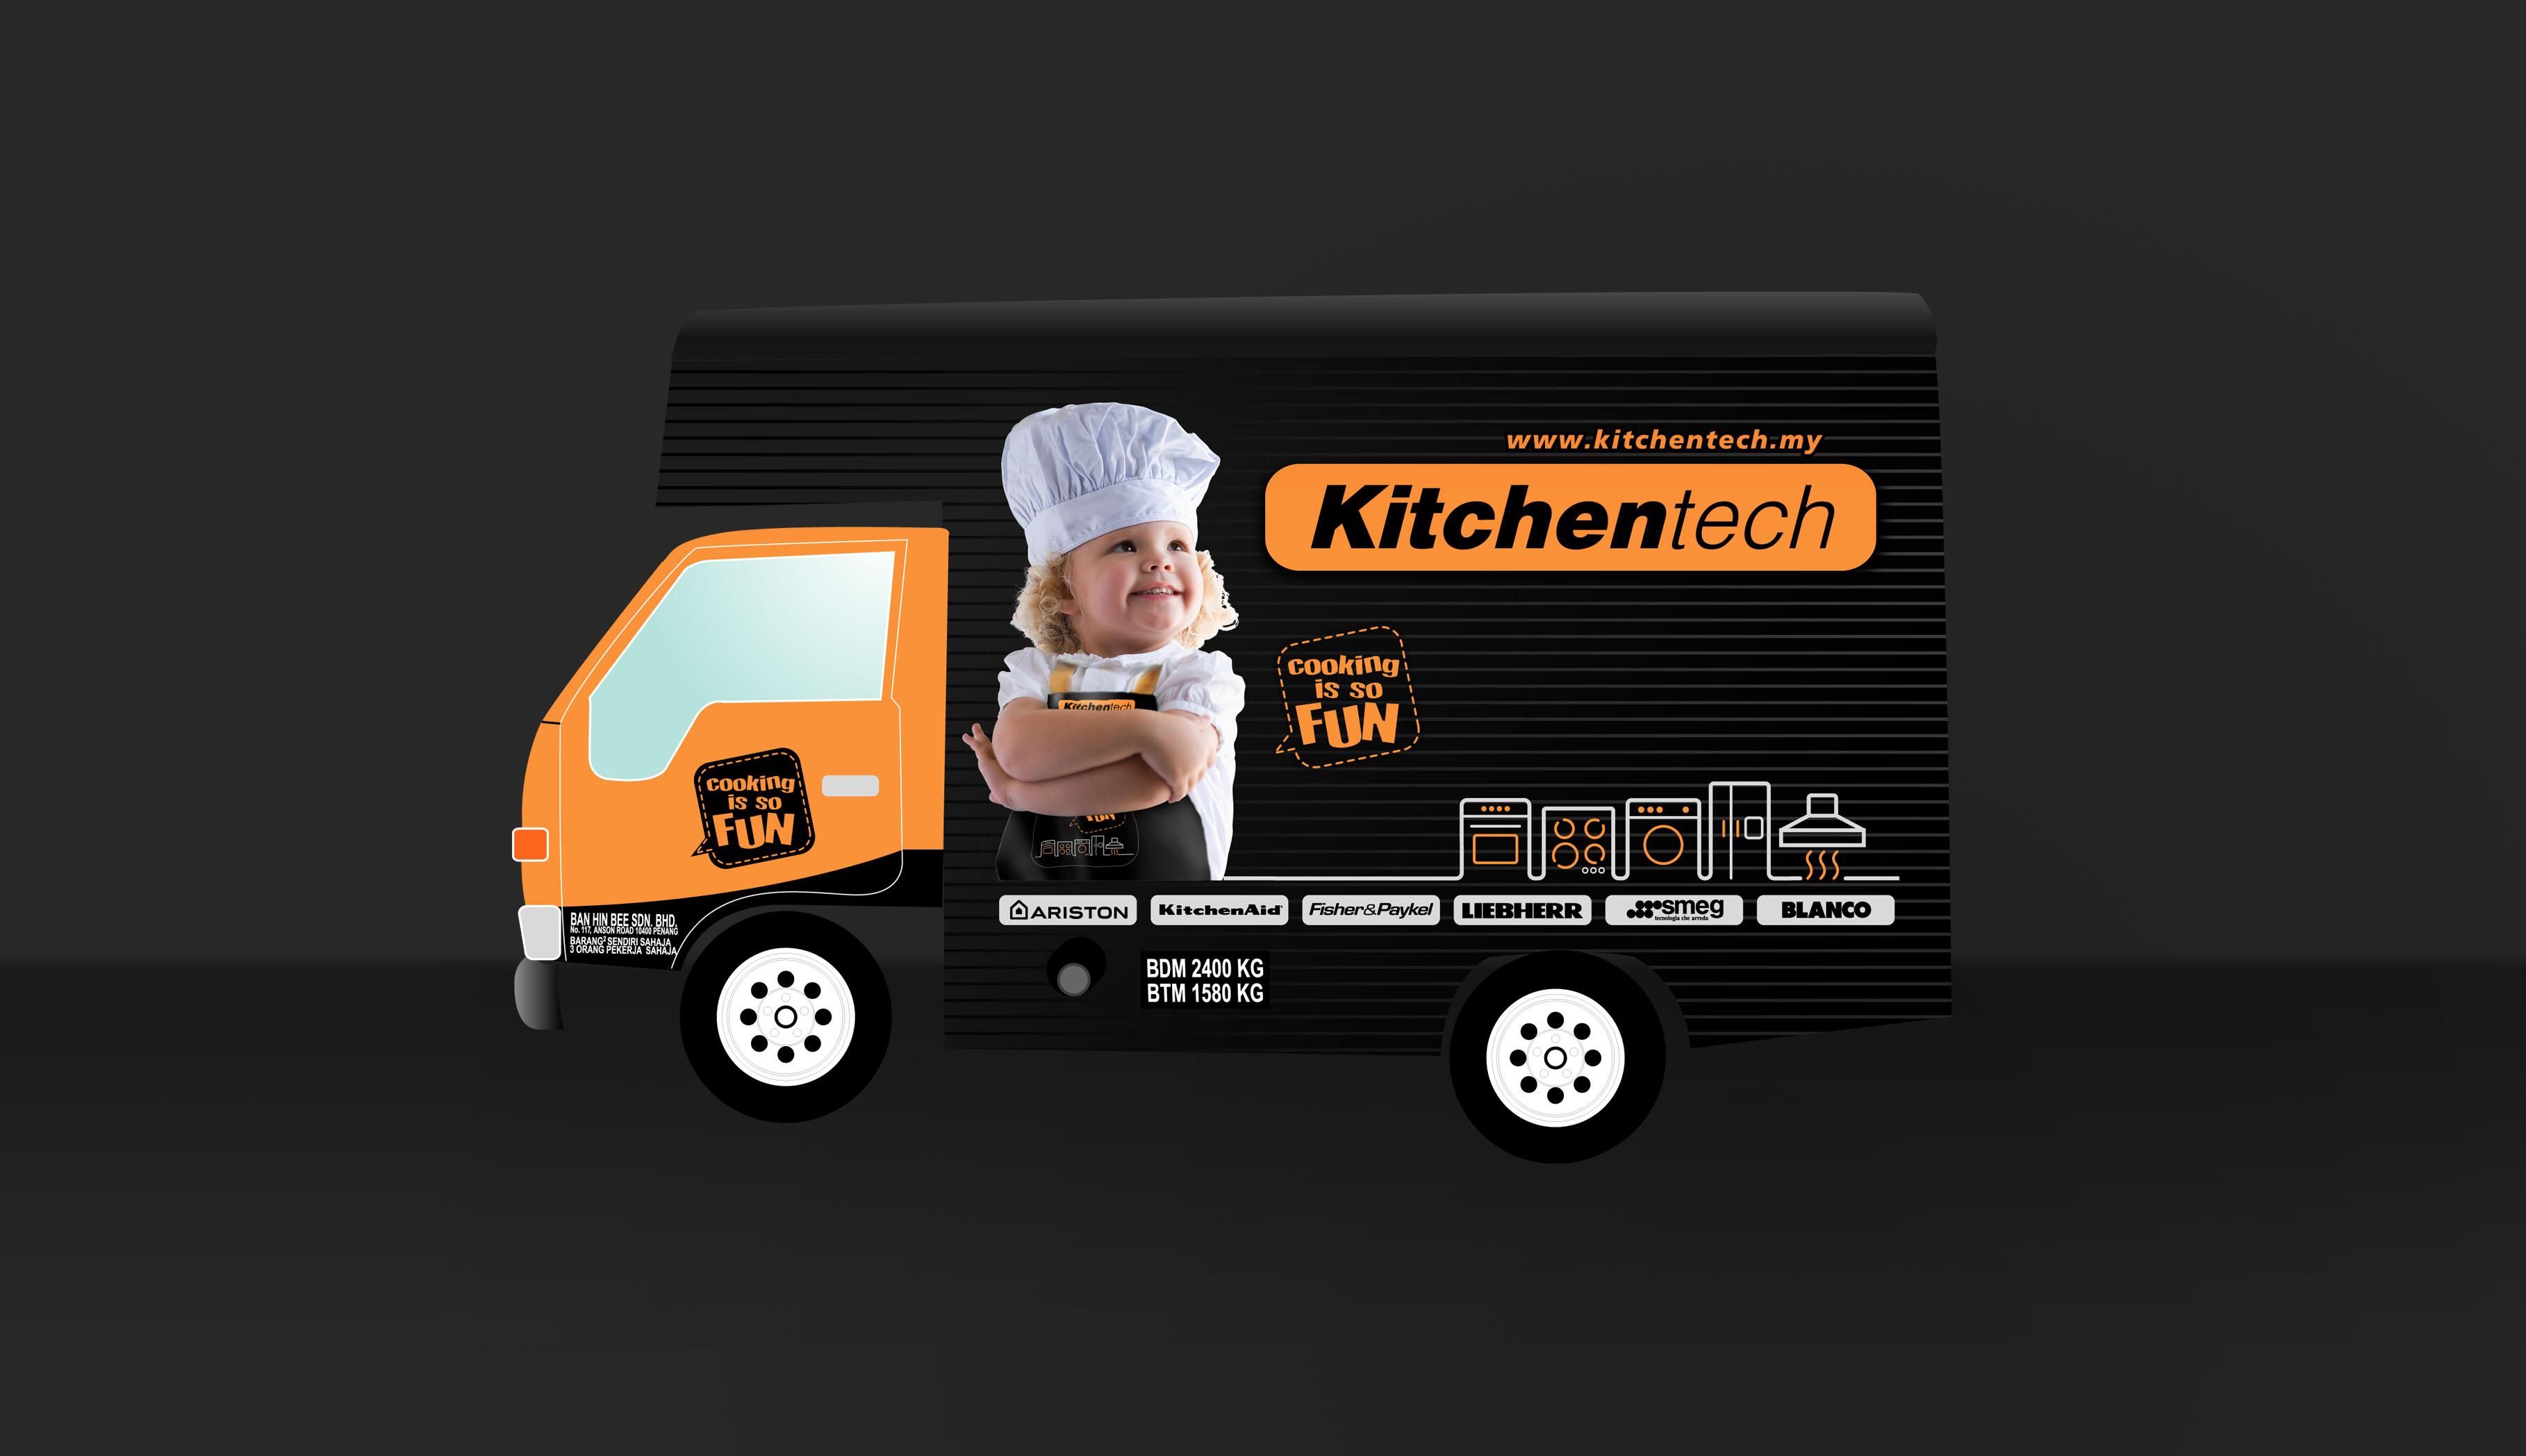 Kitchentech_5